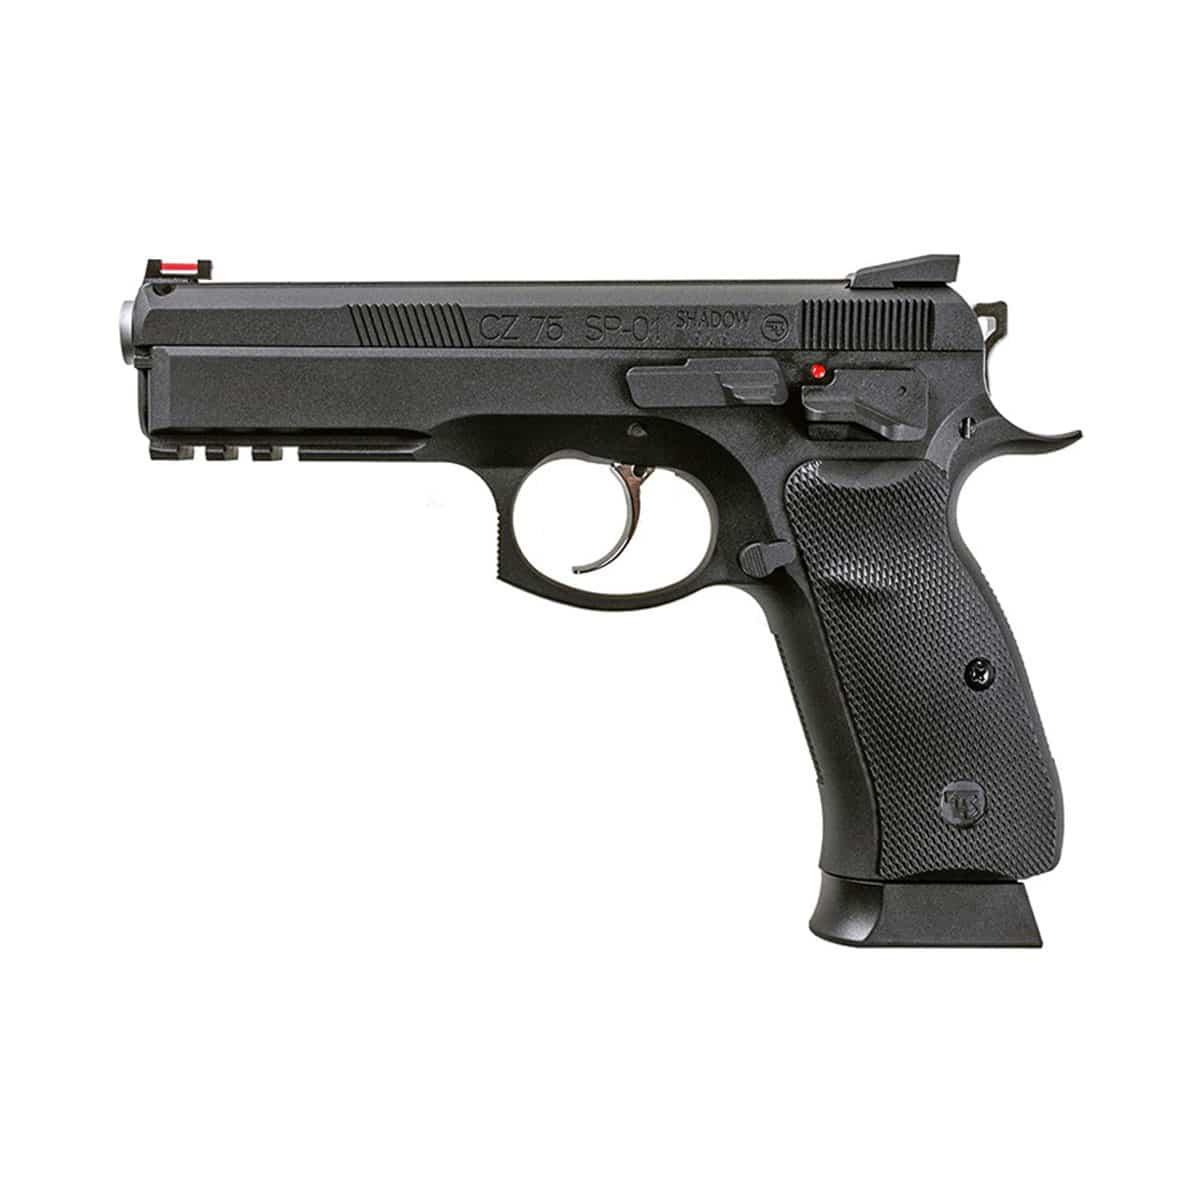 Pistola Airgun ASG CZ SP-01 Shadow CO2 4,5mm